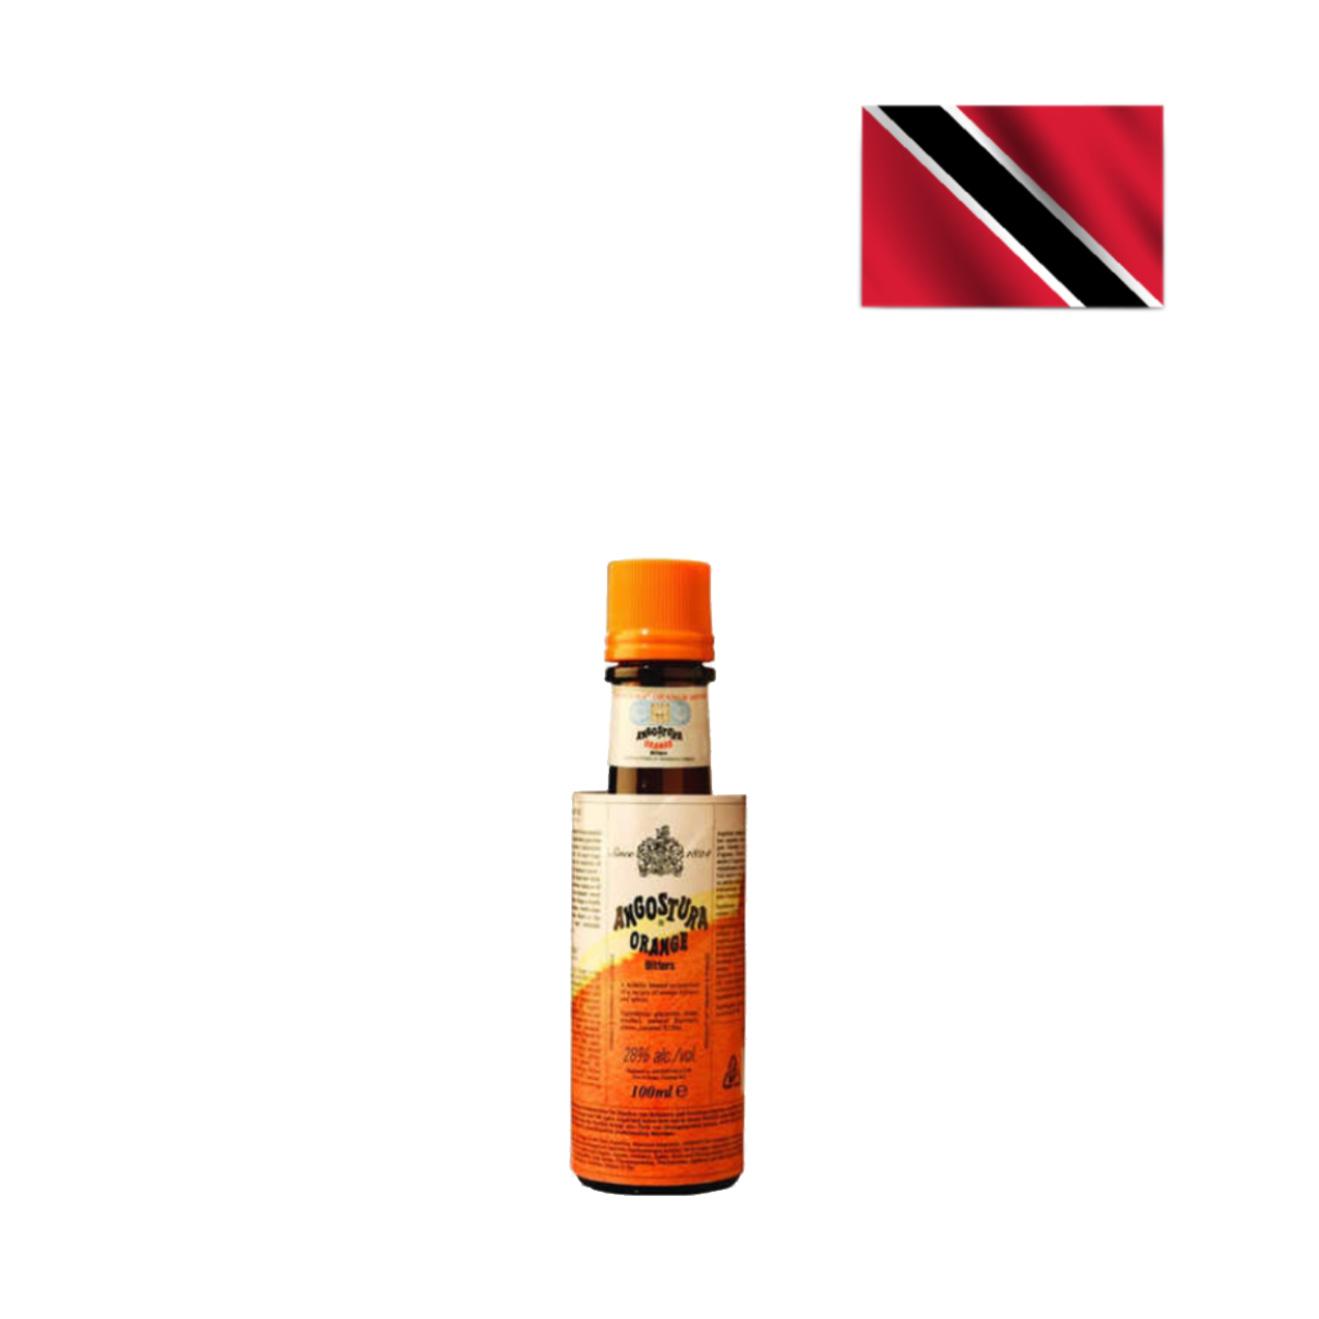 Angostura Orange Bitter 0.1l